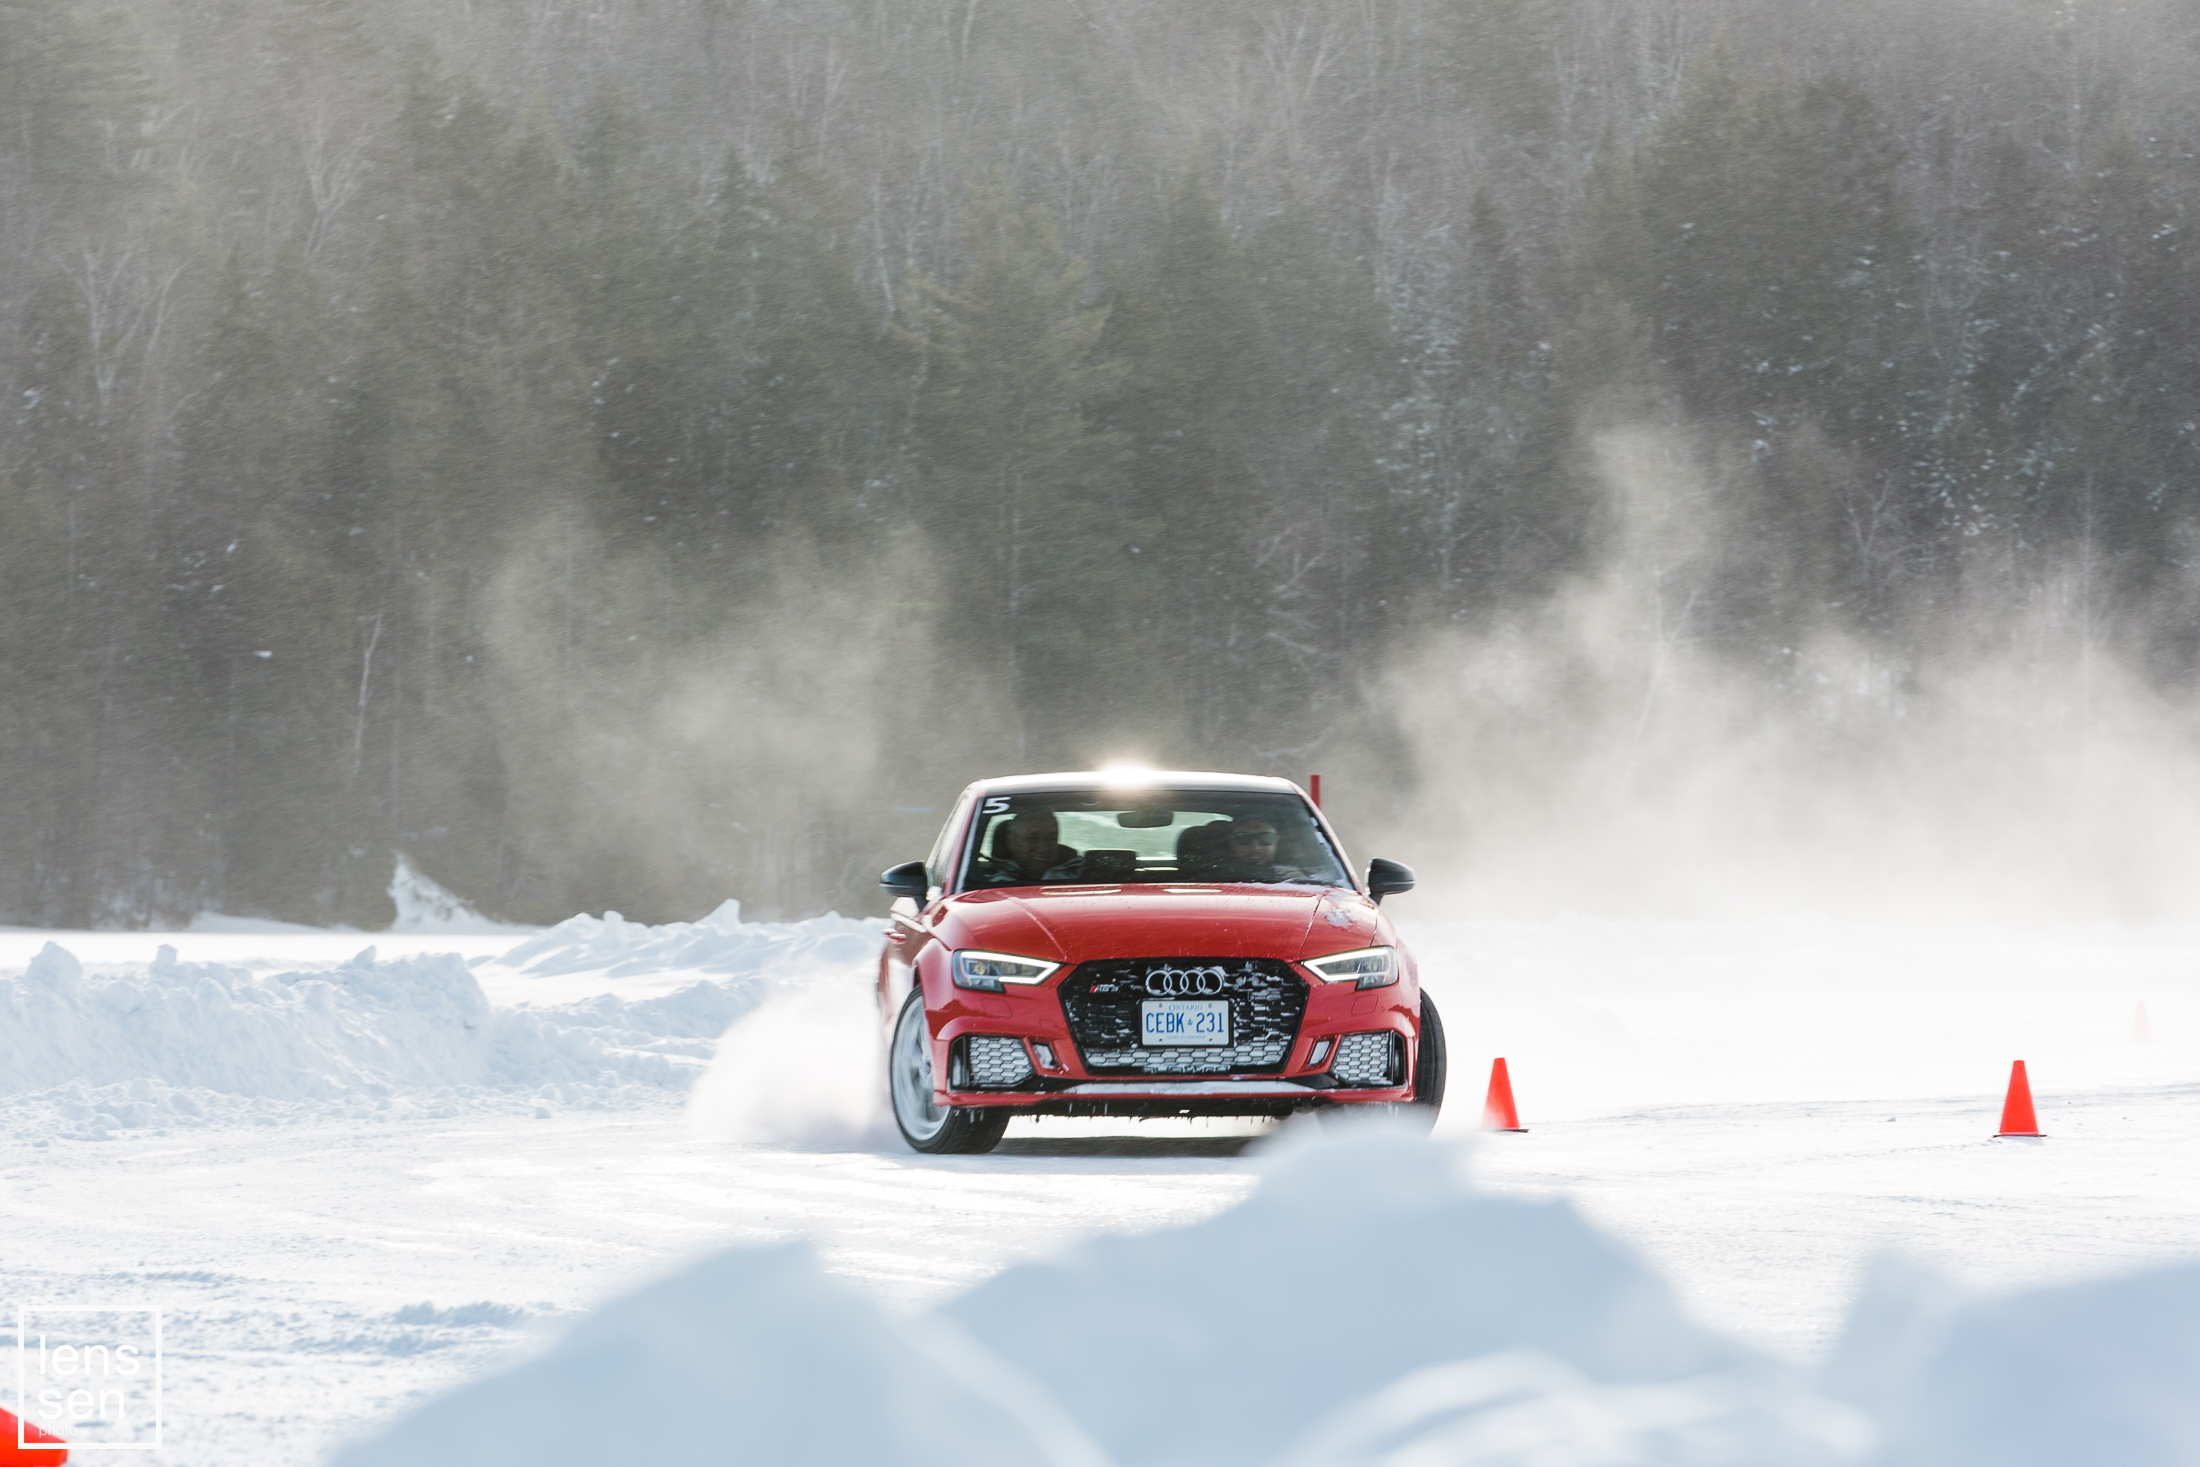 Audi Ice Experience - Sacacomie QC - Feb 2018 - 86 -4292.jpg